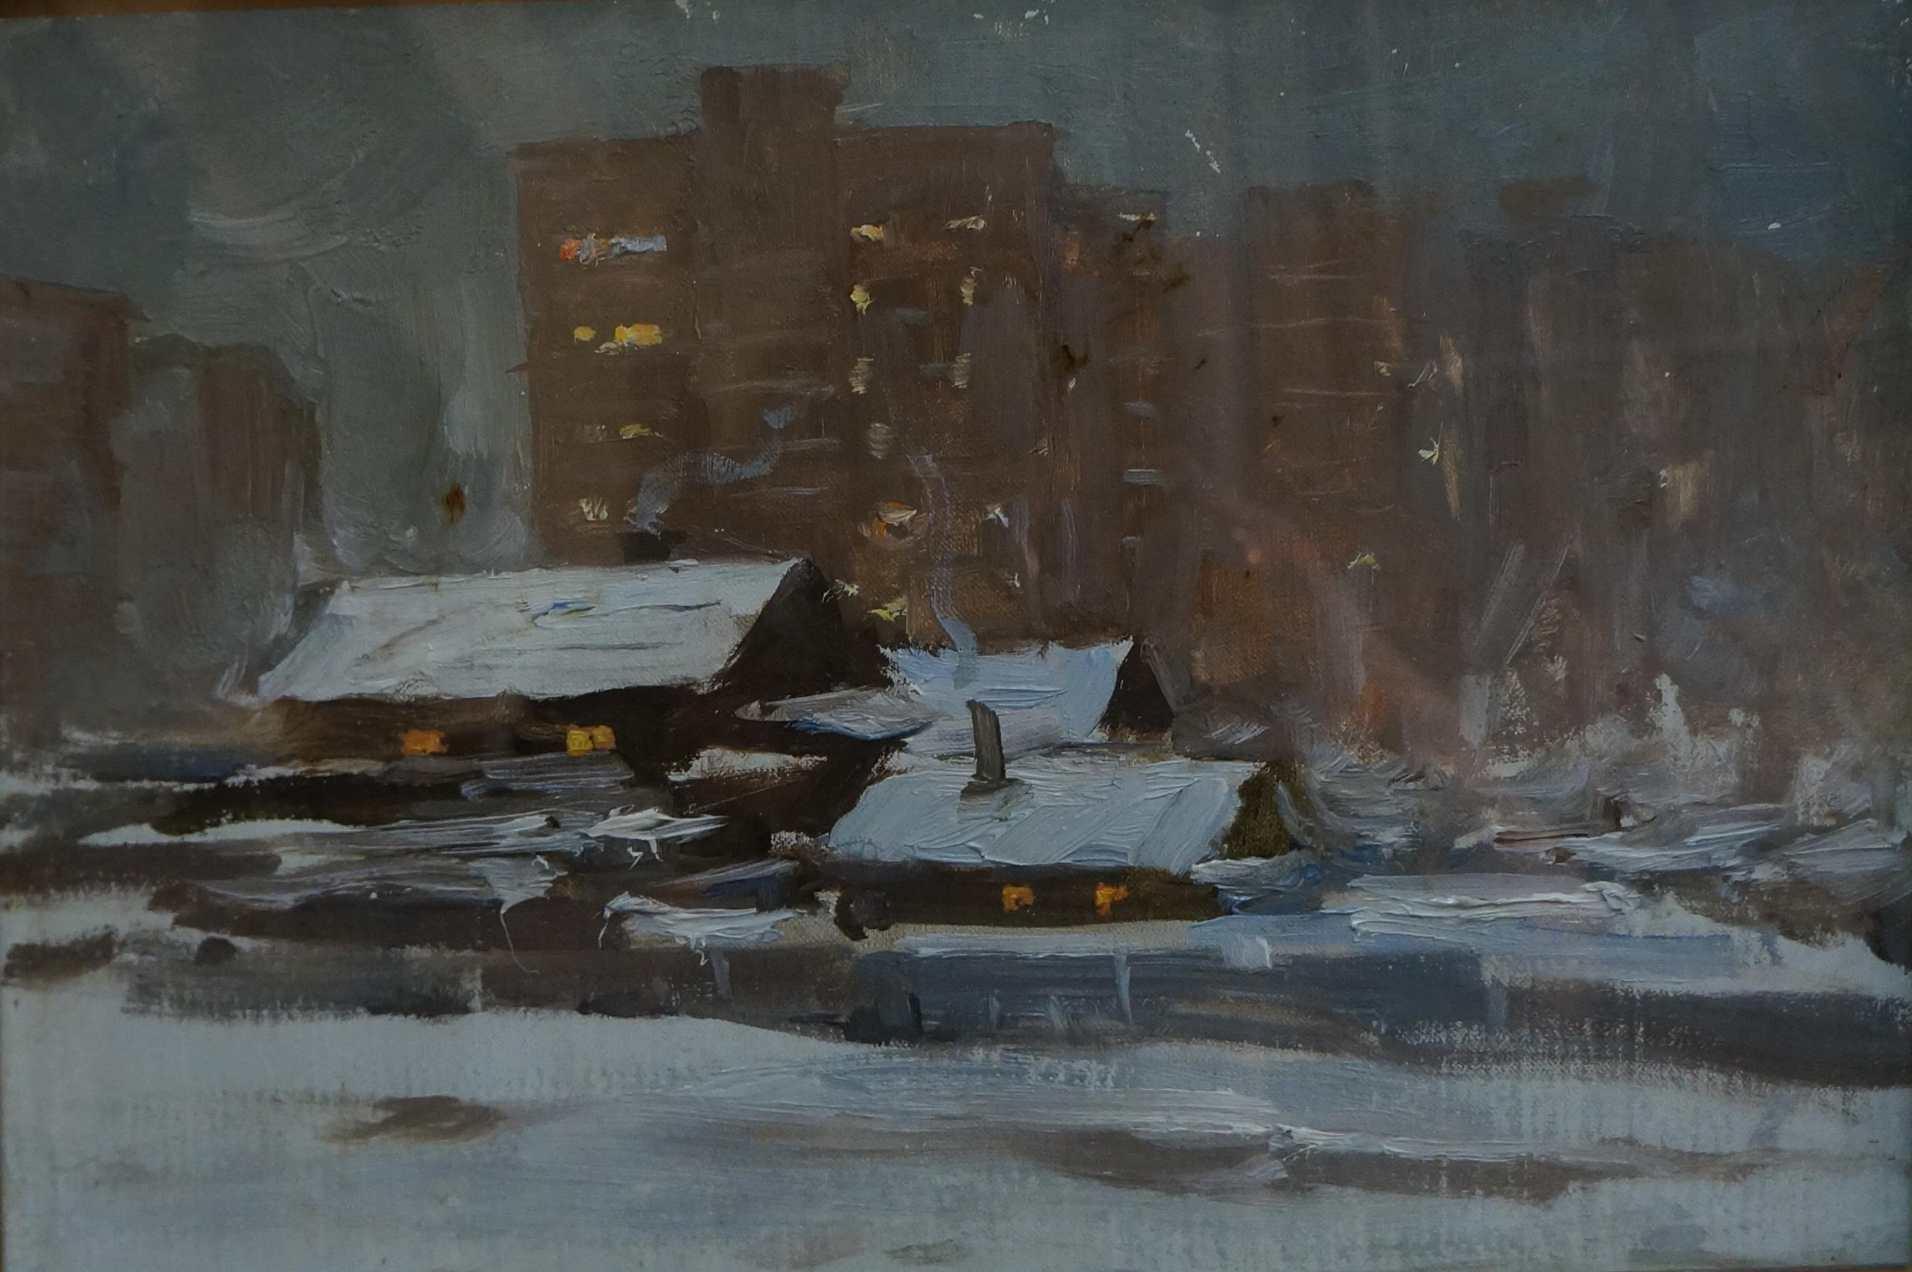 Бабанин Ф. Н. Городская окраина Владивостока. 1986. Картон, масло. 24х35